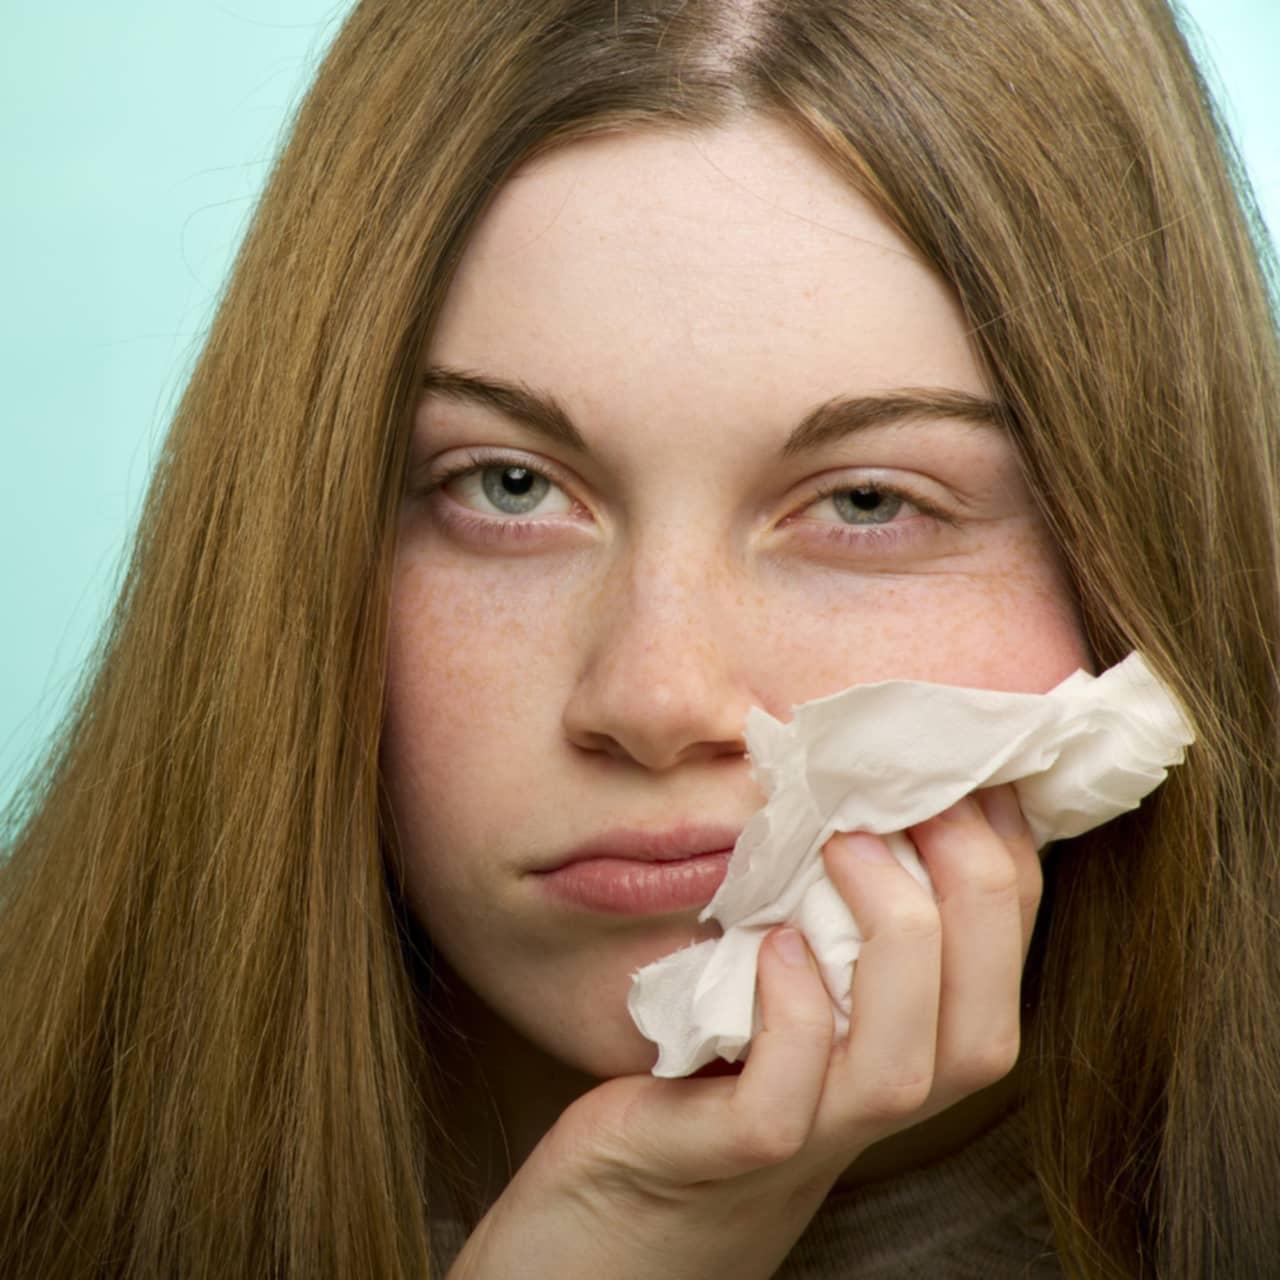 årets influensa sex dansk